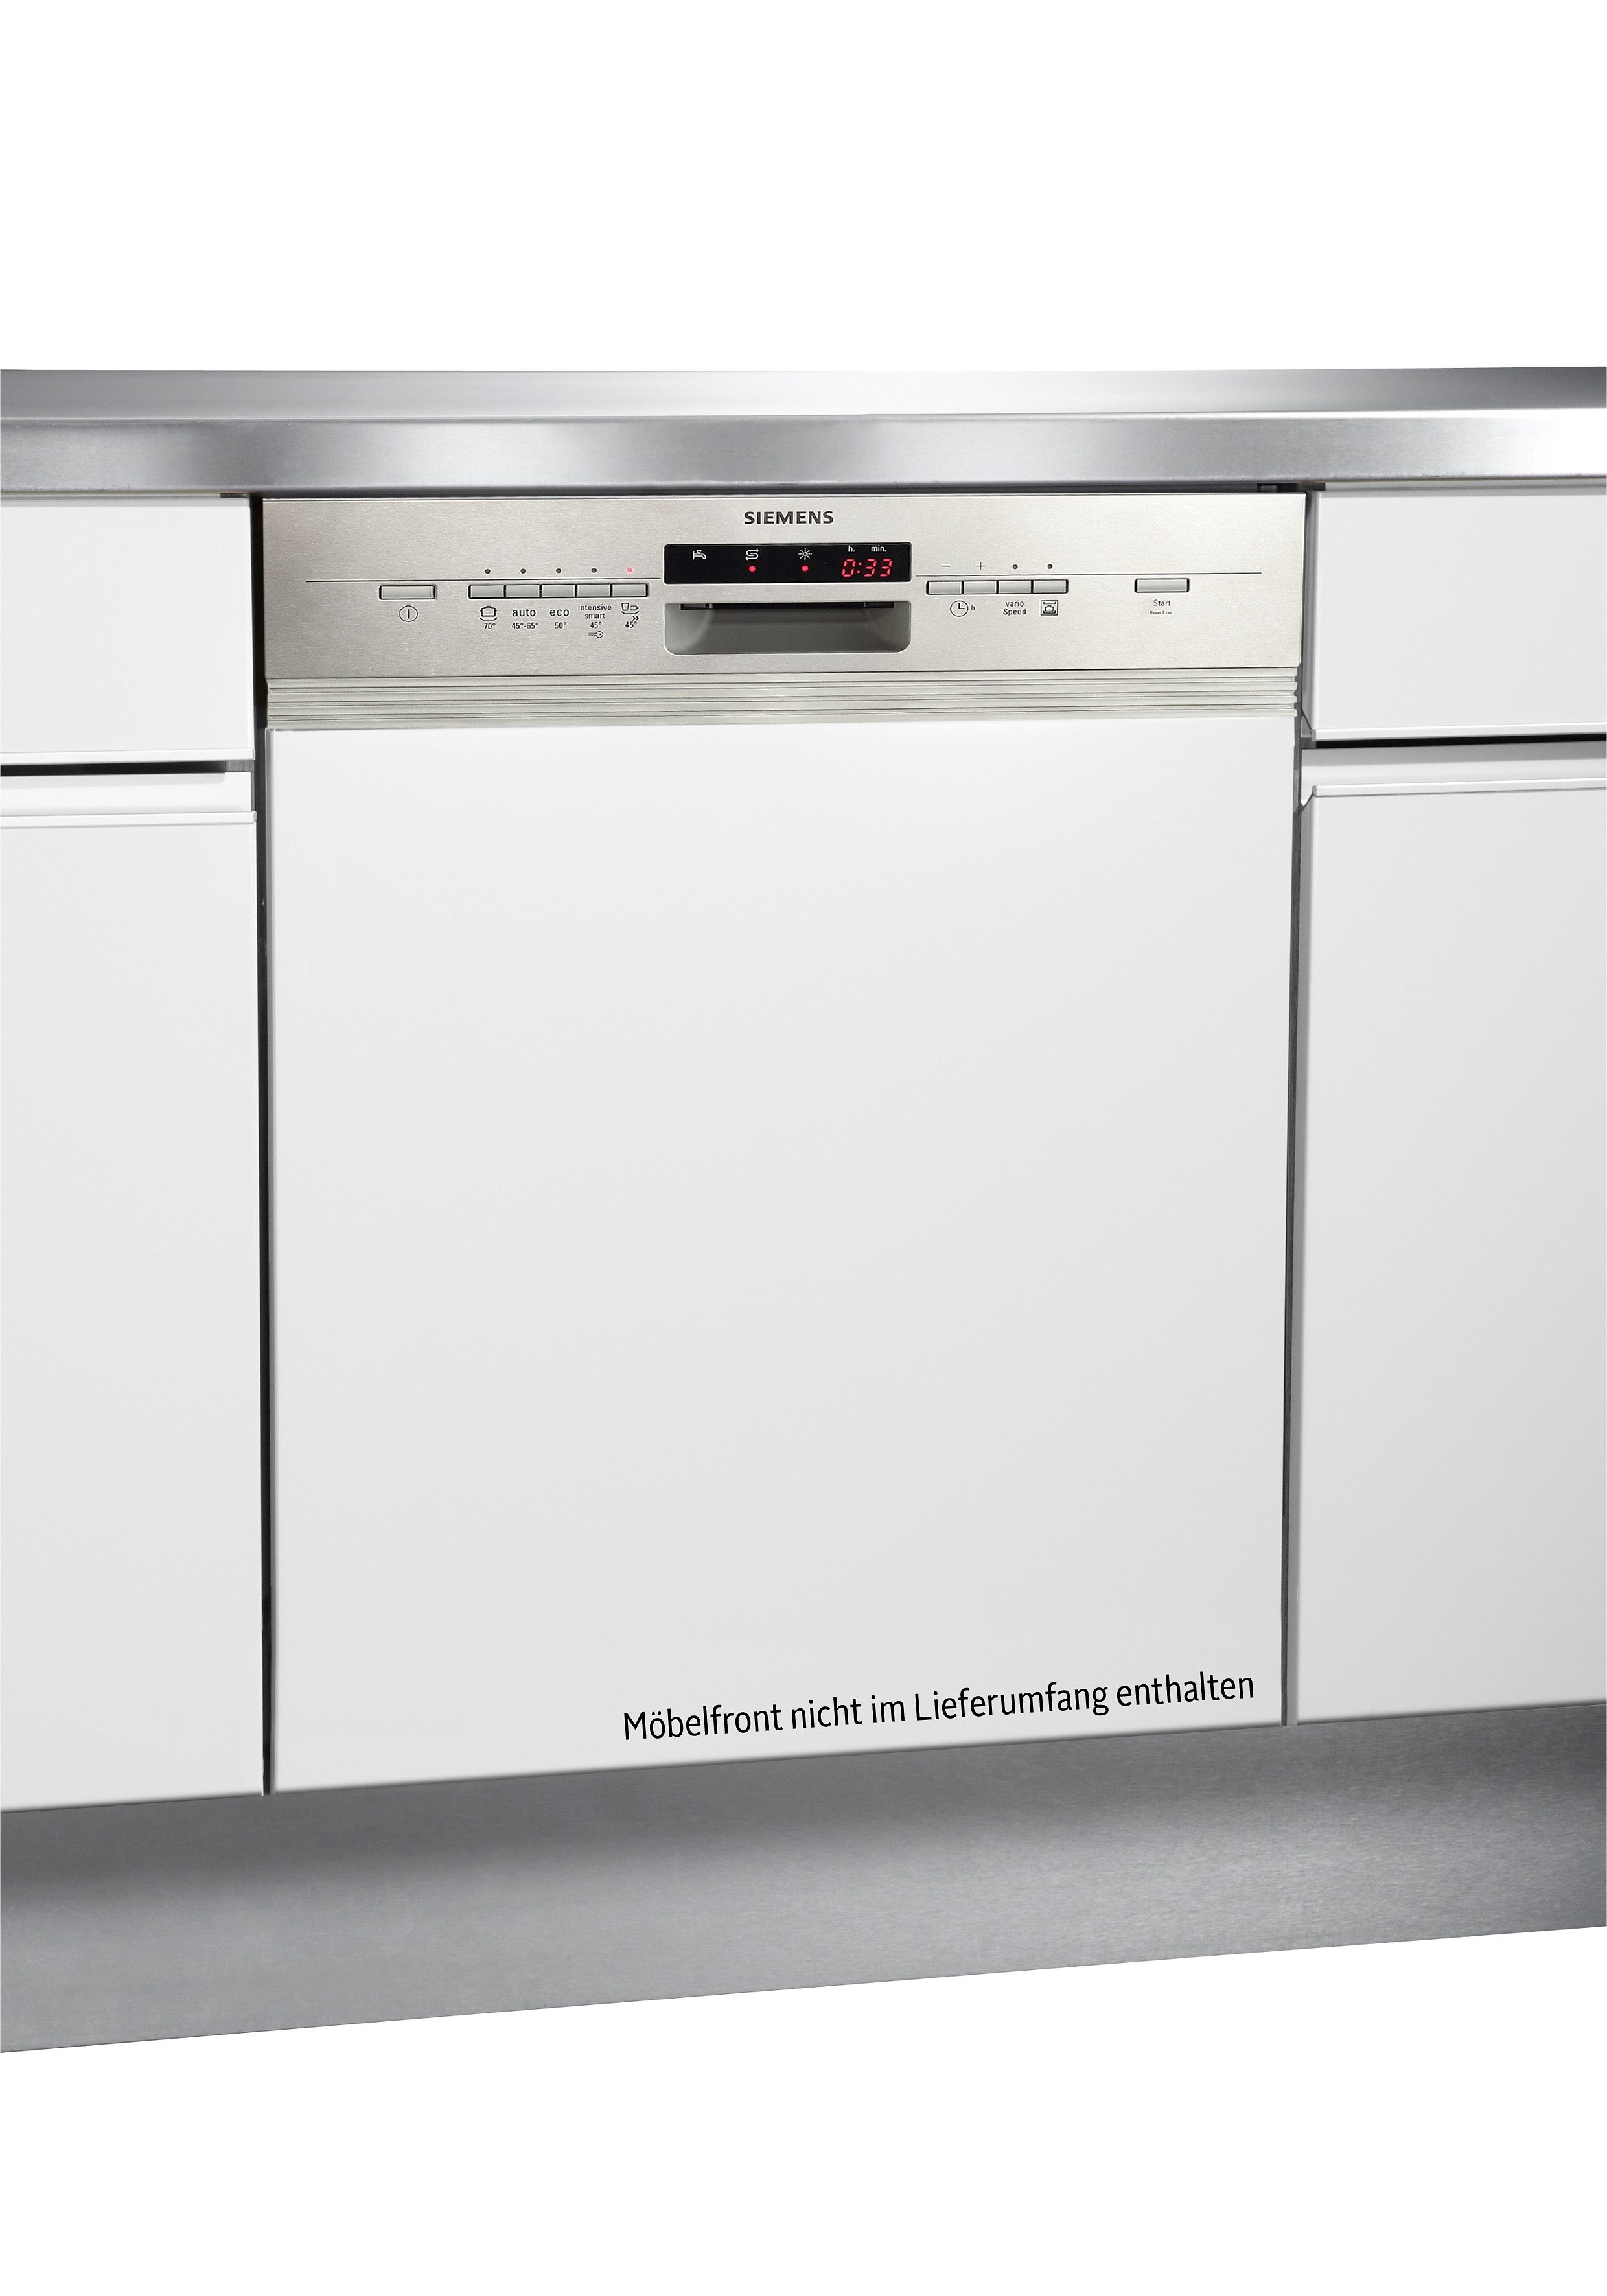 Siemens Integrierbarer Geschirrspüler SN55L530EU, A++, 10 Liter, für 12 Maßgedecke